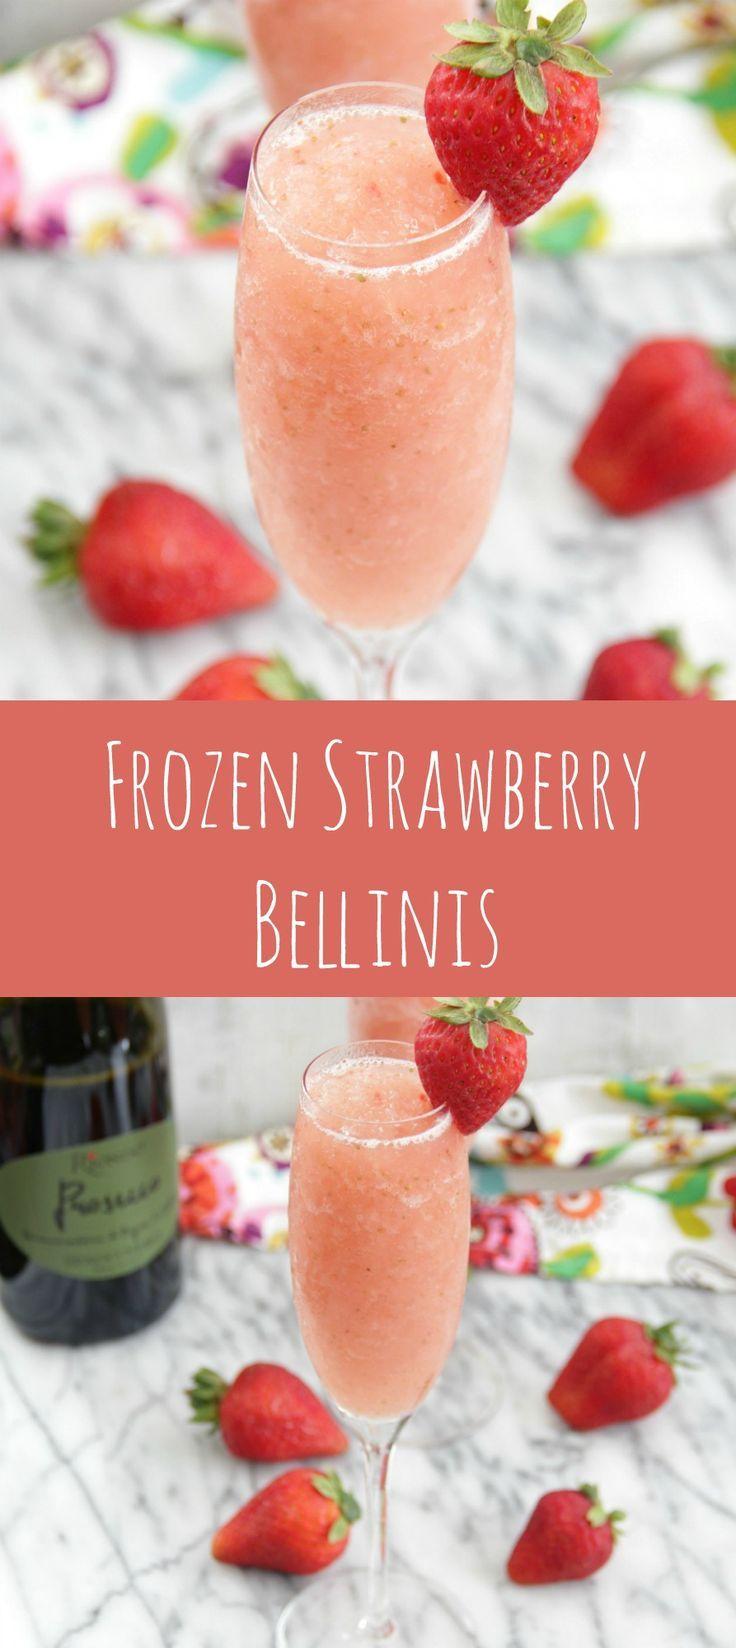 Frozen Strawberry Bellinis #riondoprosecco #italianforsummer #sponsored